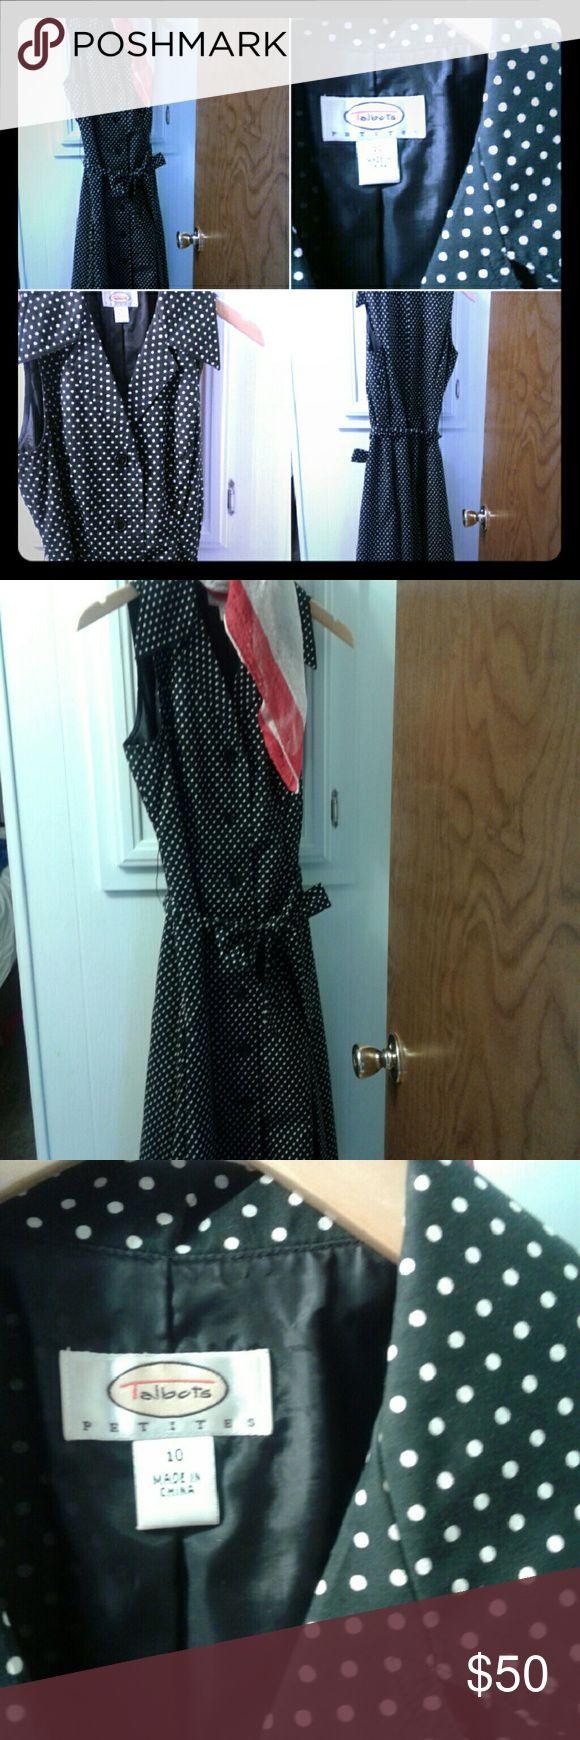 Talbots petite size 10 dress Gently worn Talbots black and white polka-dot petite dress with self sash. Looks new. Talbots Dresses